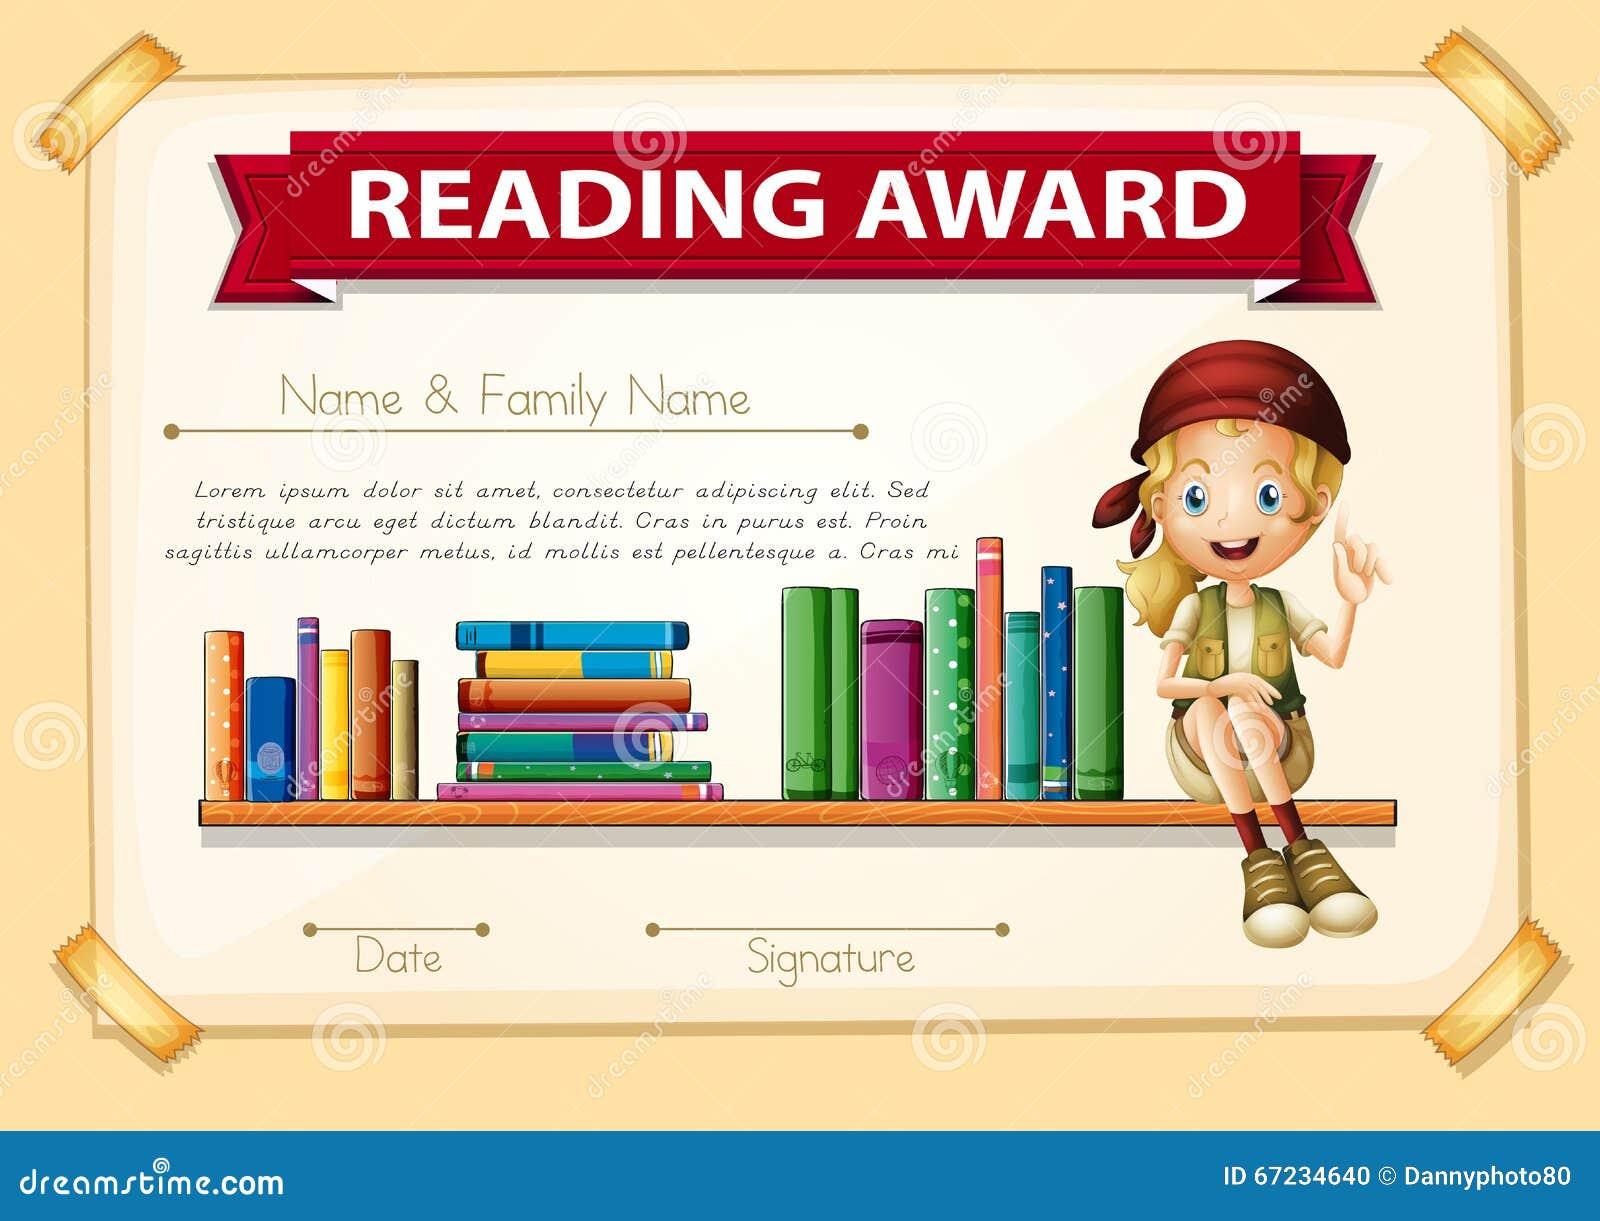 Printable Awards Super Teacher Worksheets